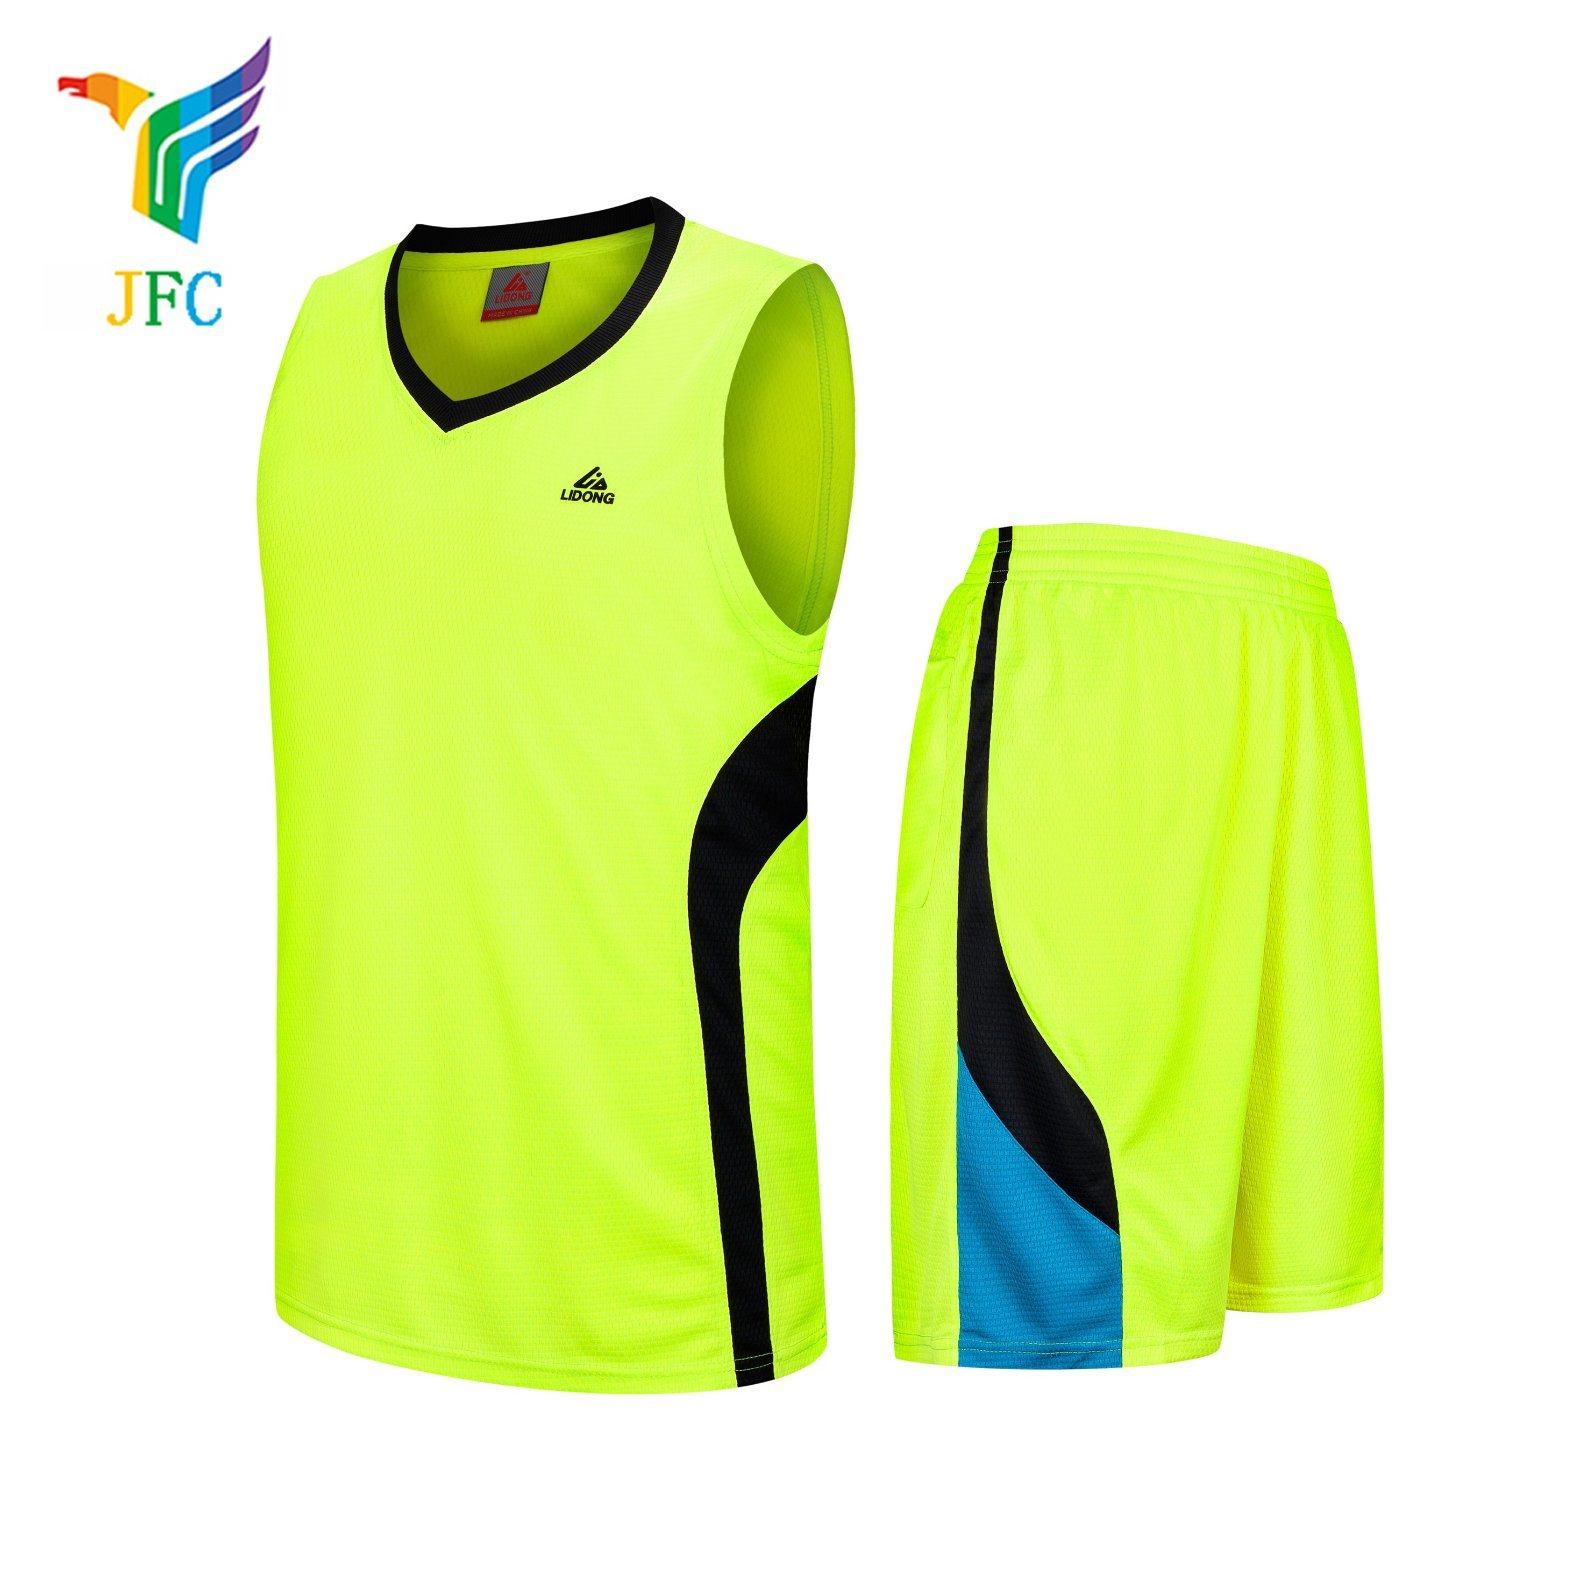 4112cdb3baf China Jfc New Design Breathable Quick Dry Custom Team Basketball Uniform  for Men Basketball Jerseys - China New Design Basketball Uniform